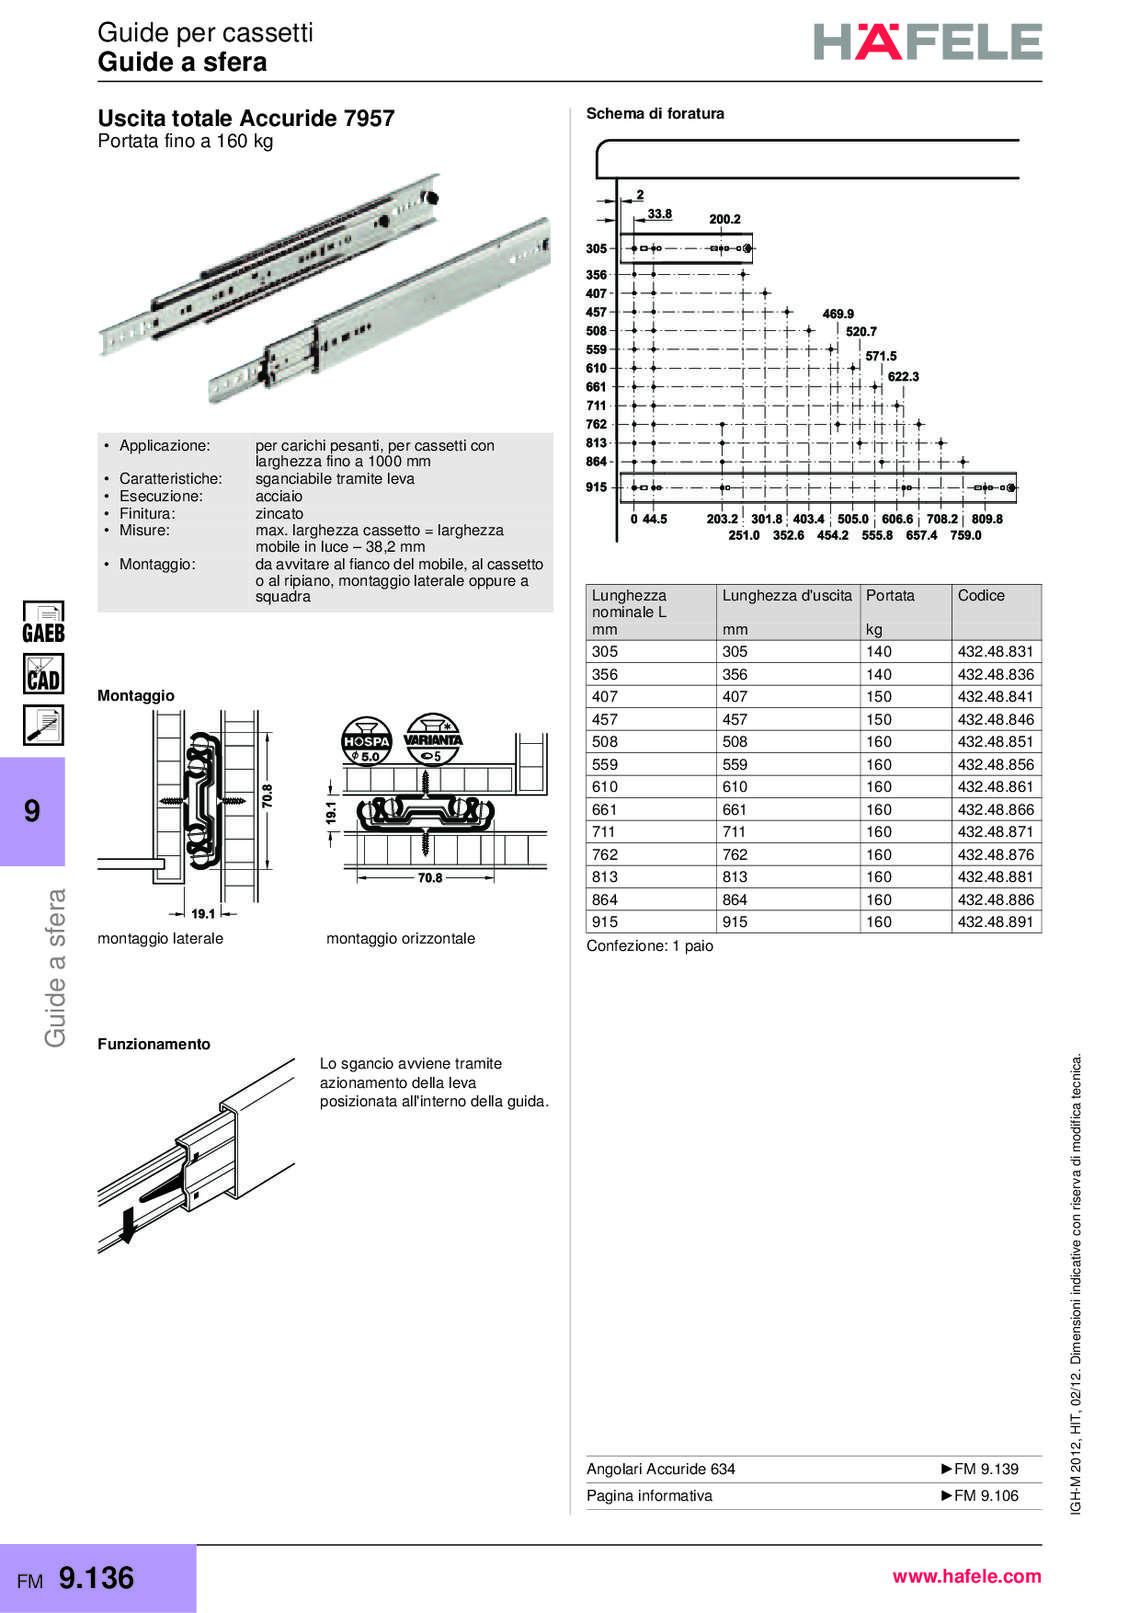 hafele-spondine-e-guide-per-mobili_40_193.jpg